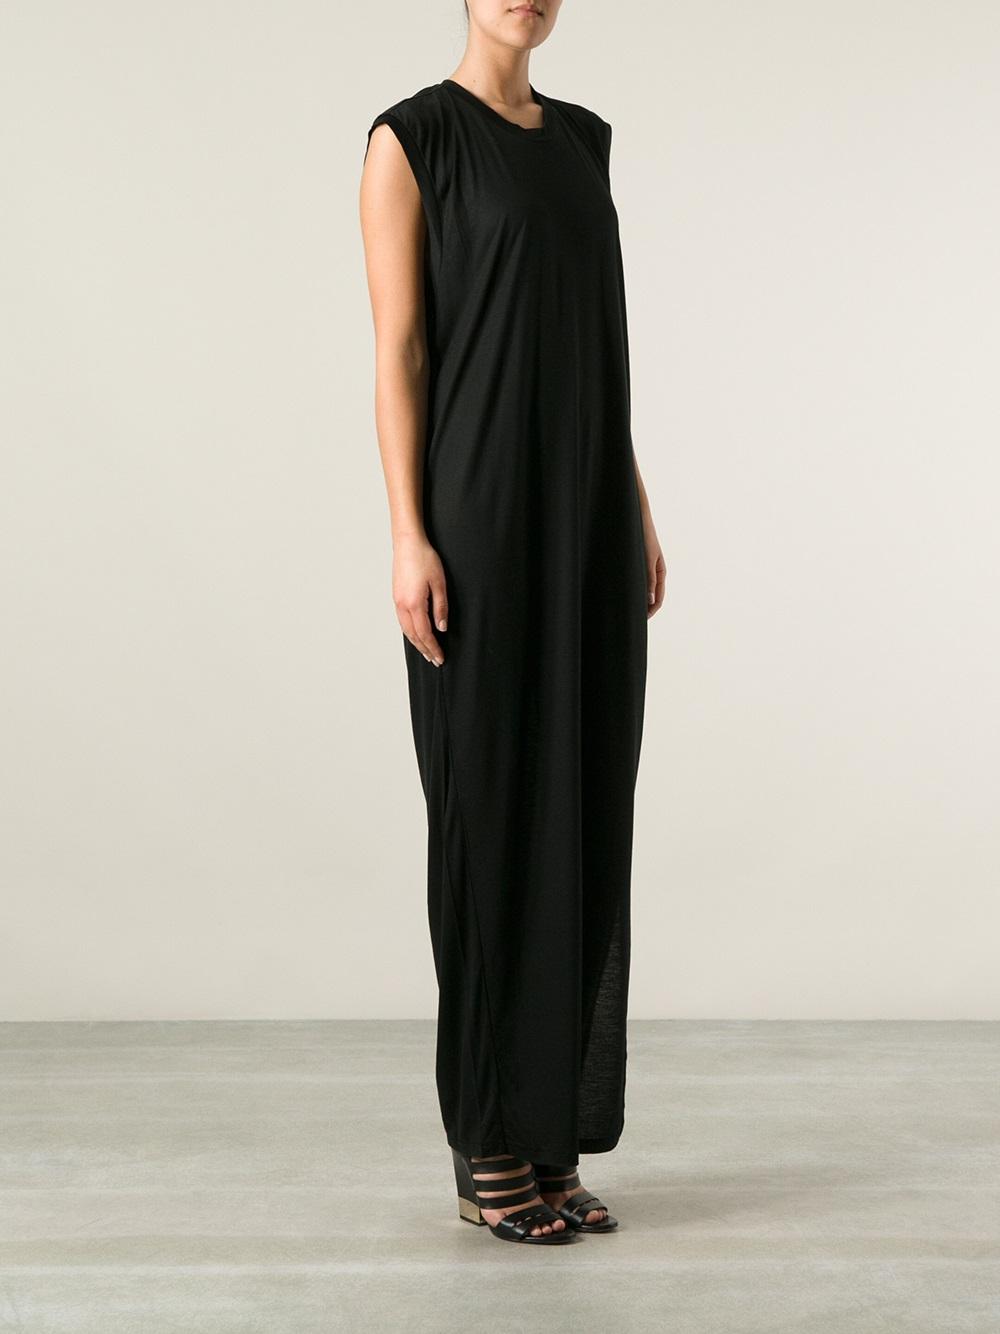 Acne Draped Back Maxi Dress in Black - Lyst